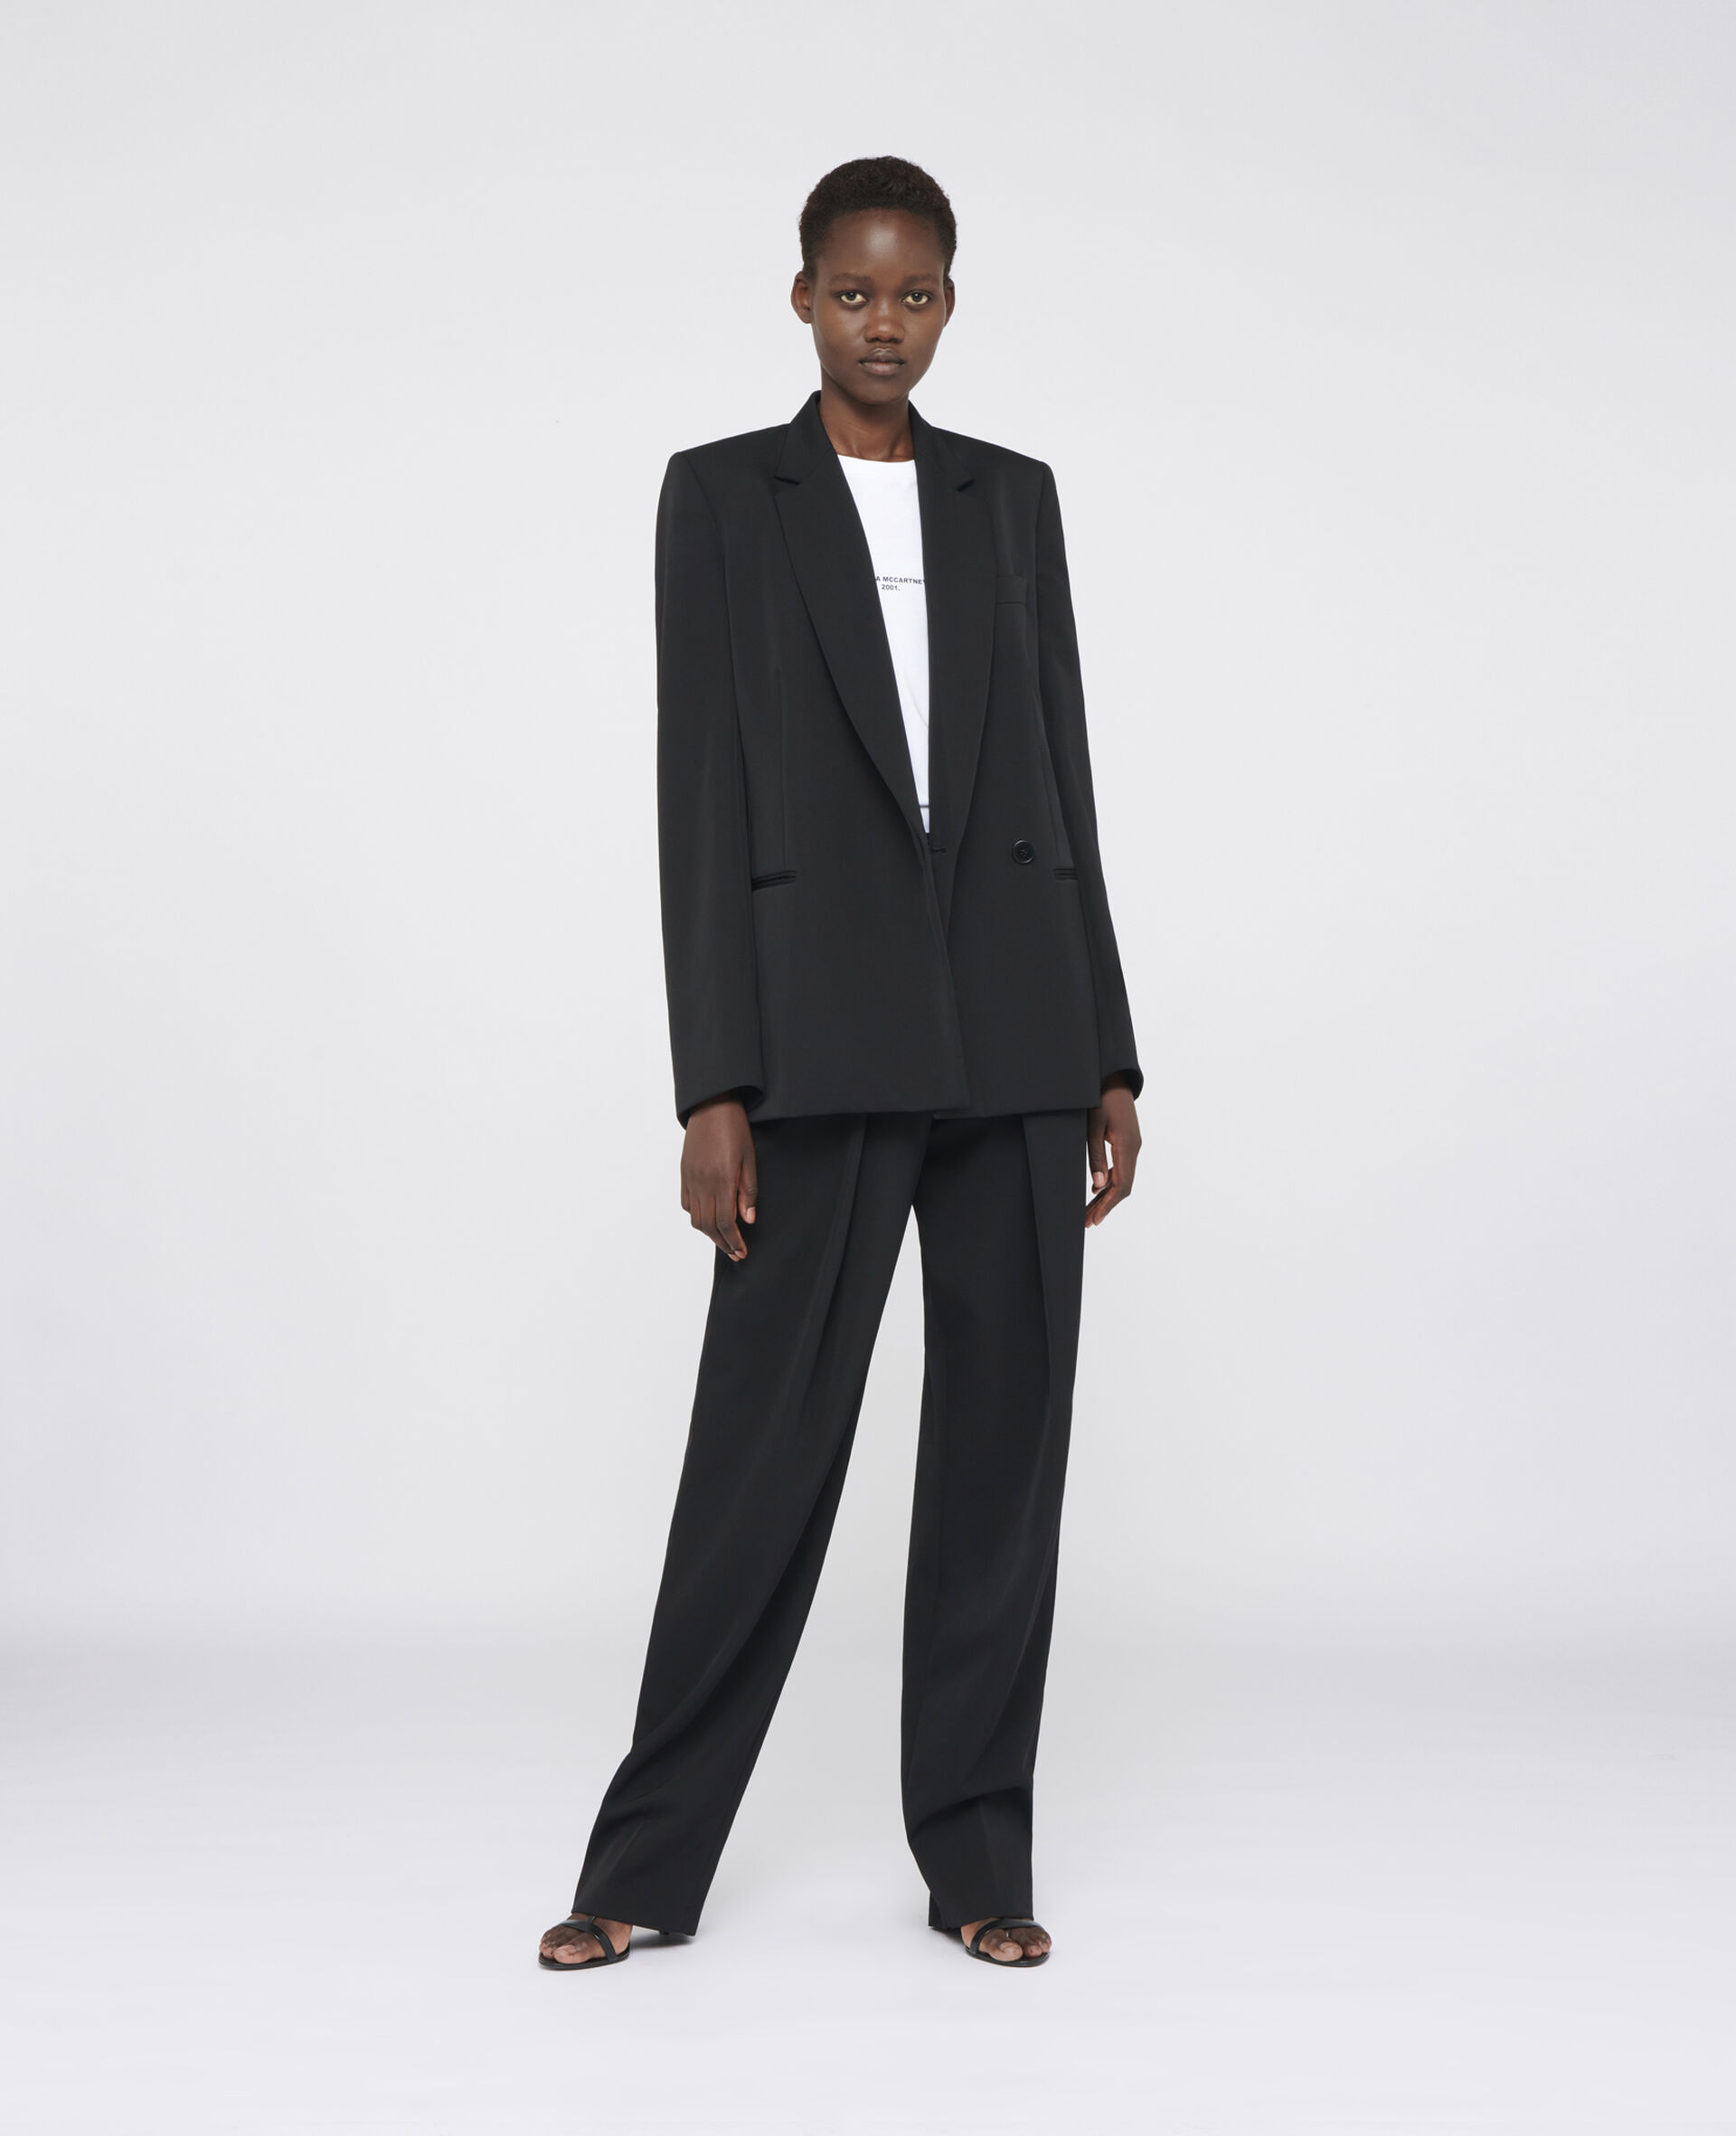 Couture-Jackett Delilah-Schwarz-large image number 1